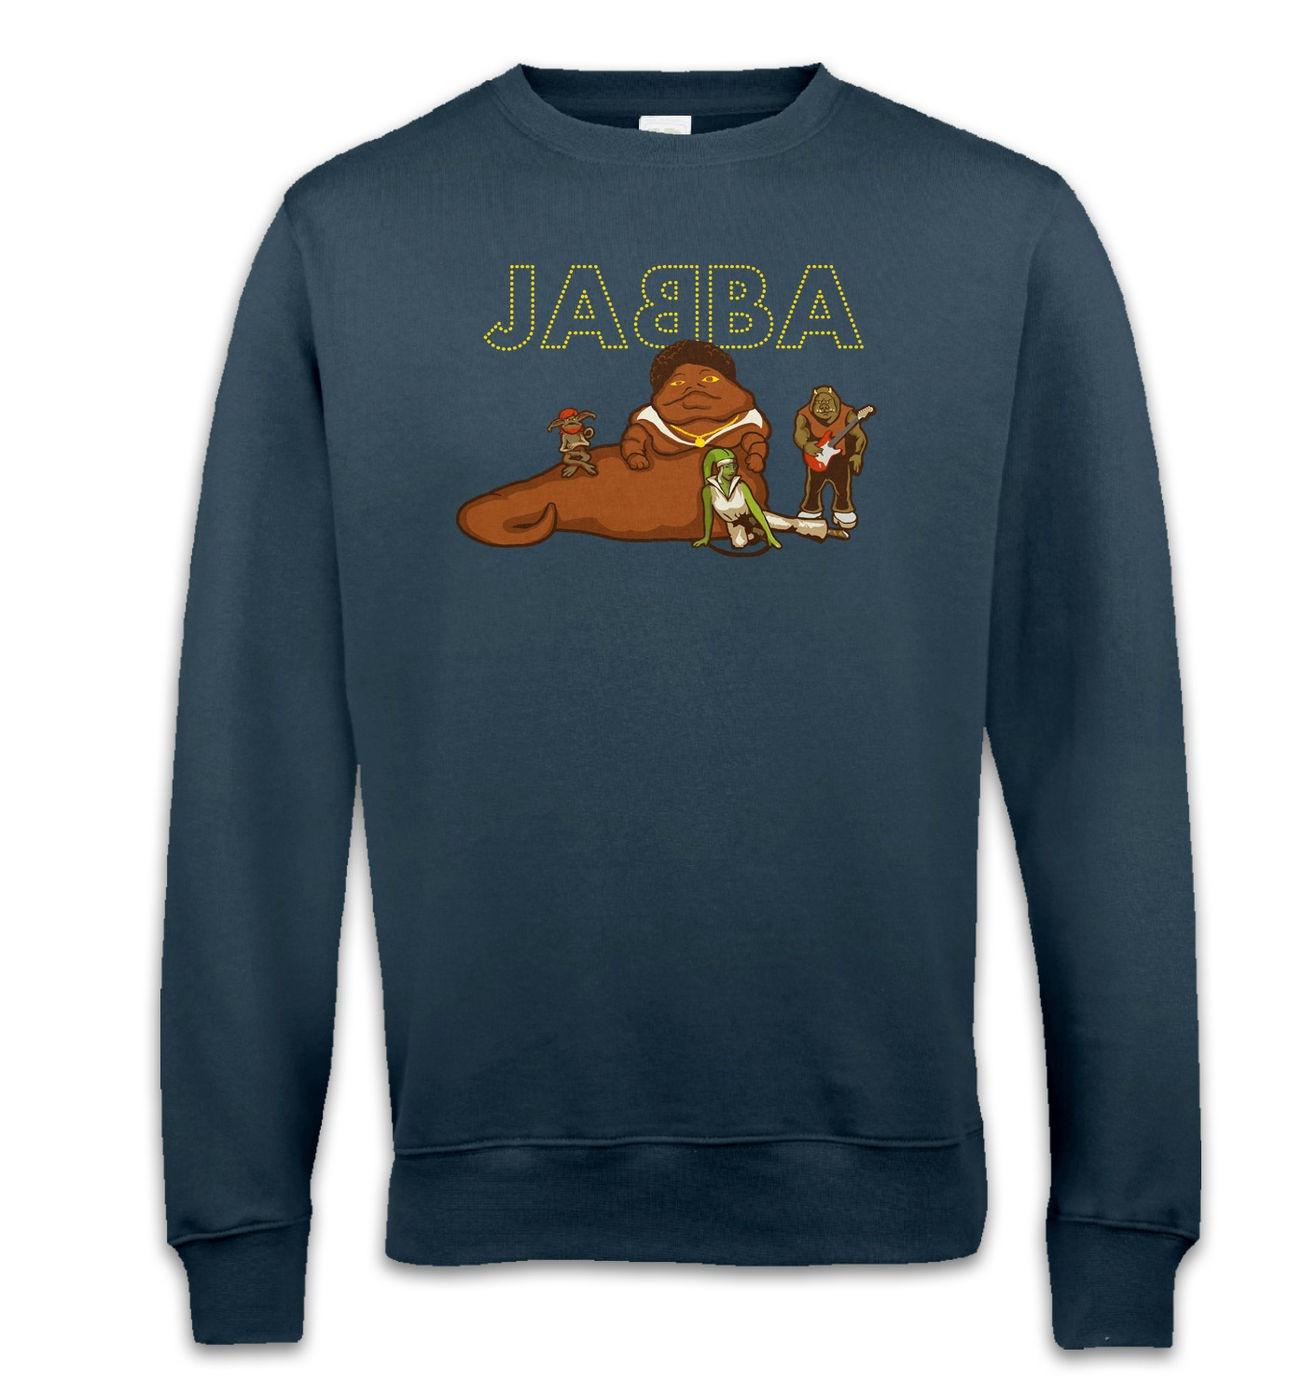 JABBA The Hutt And Friends sweatshirt